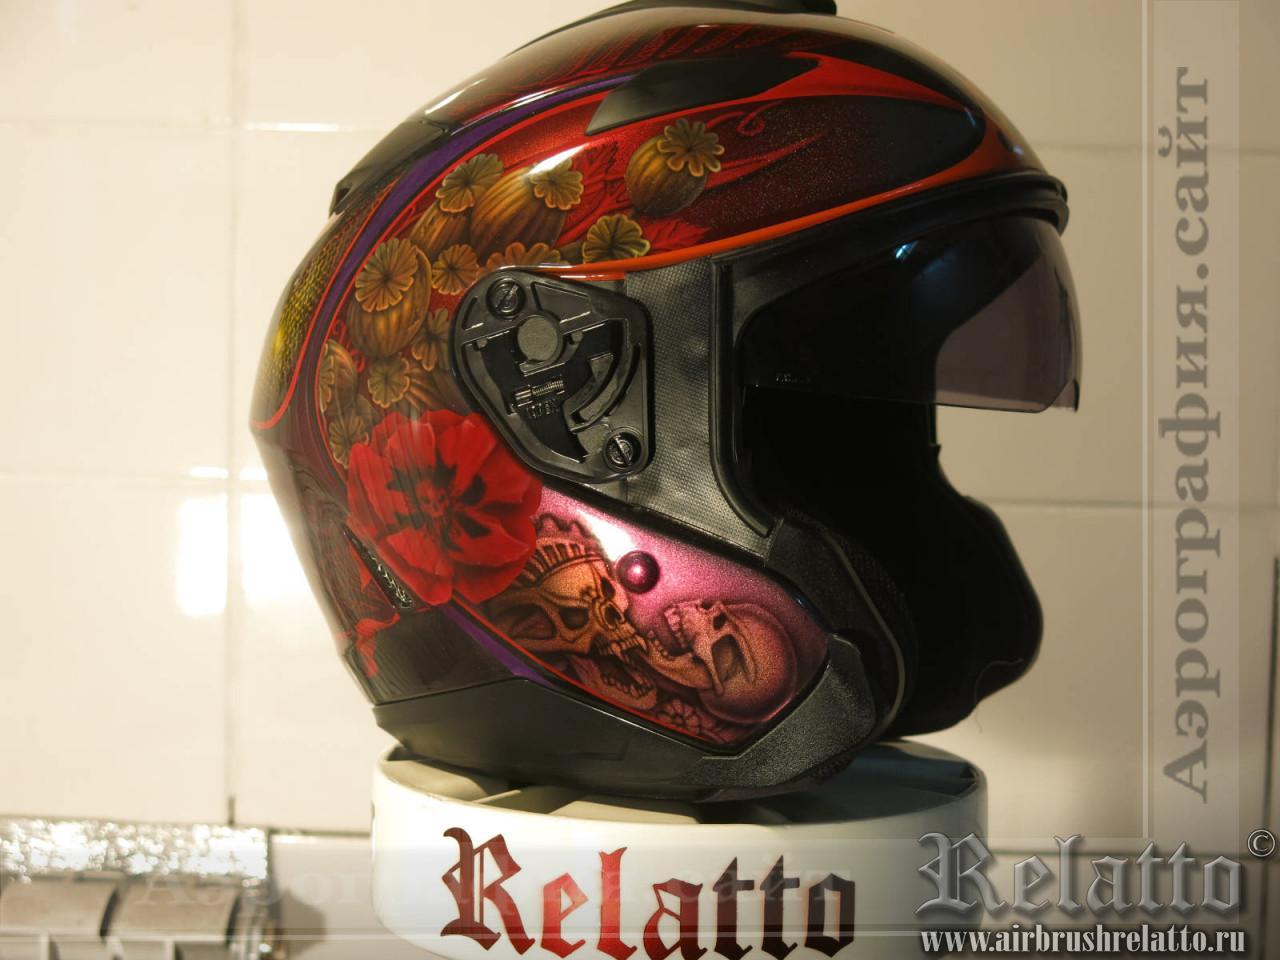 аэрография шлем HJC в Краснодаре